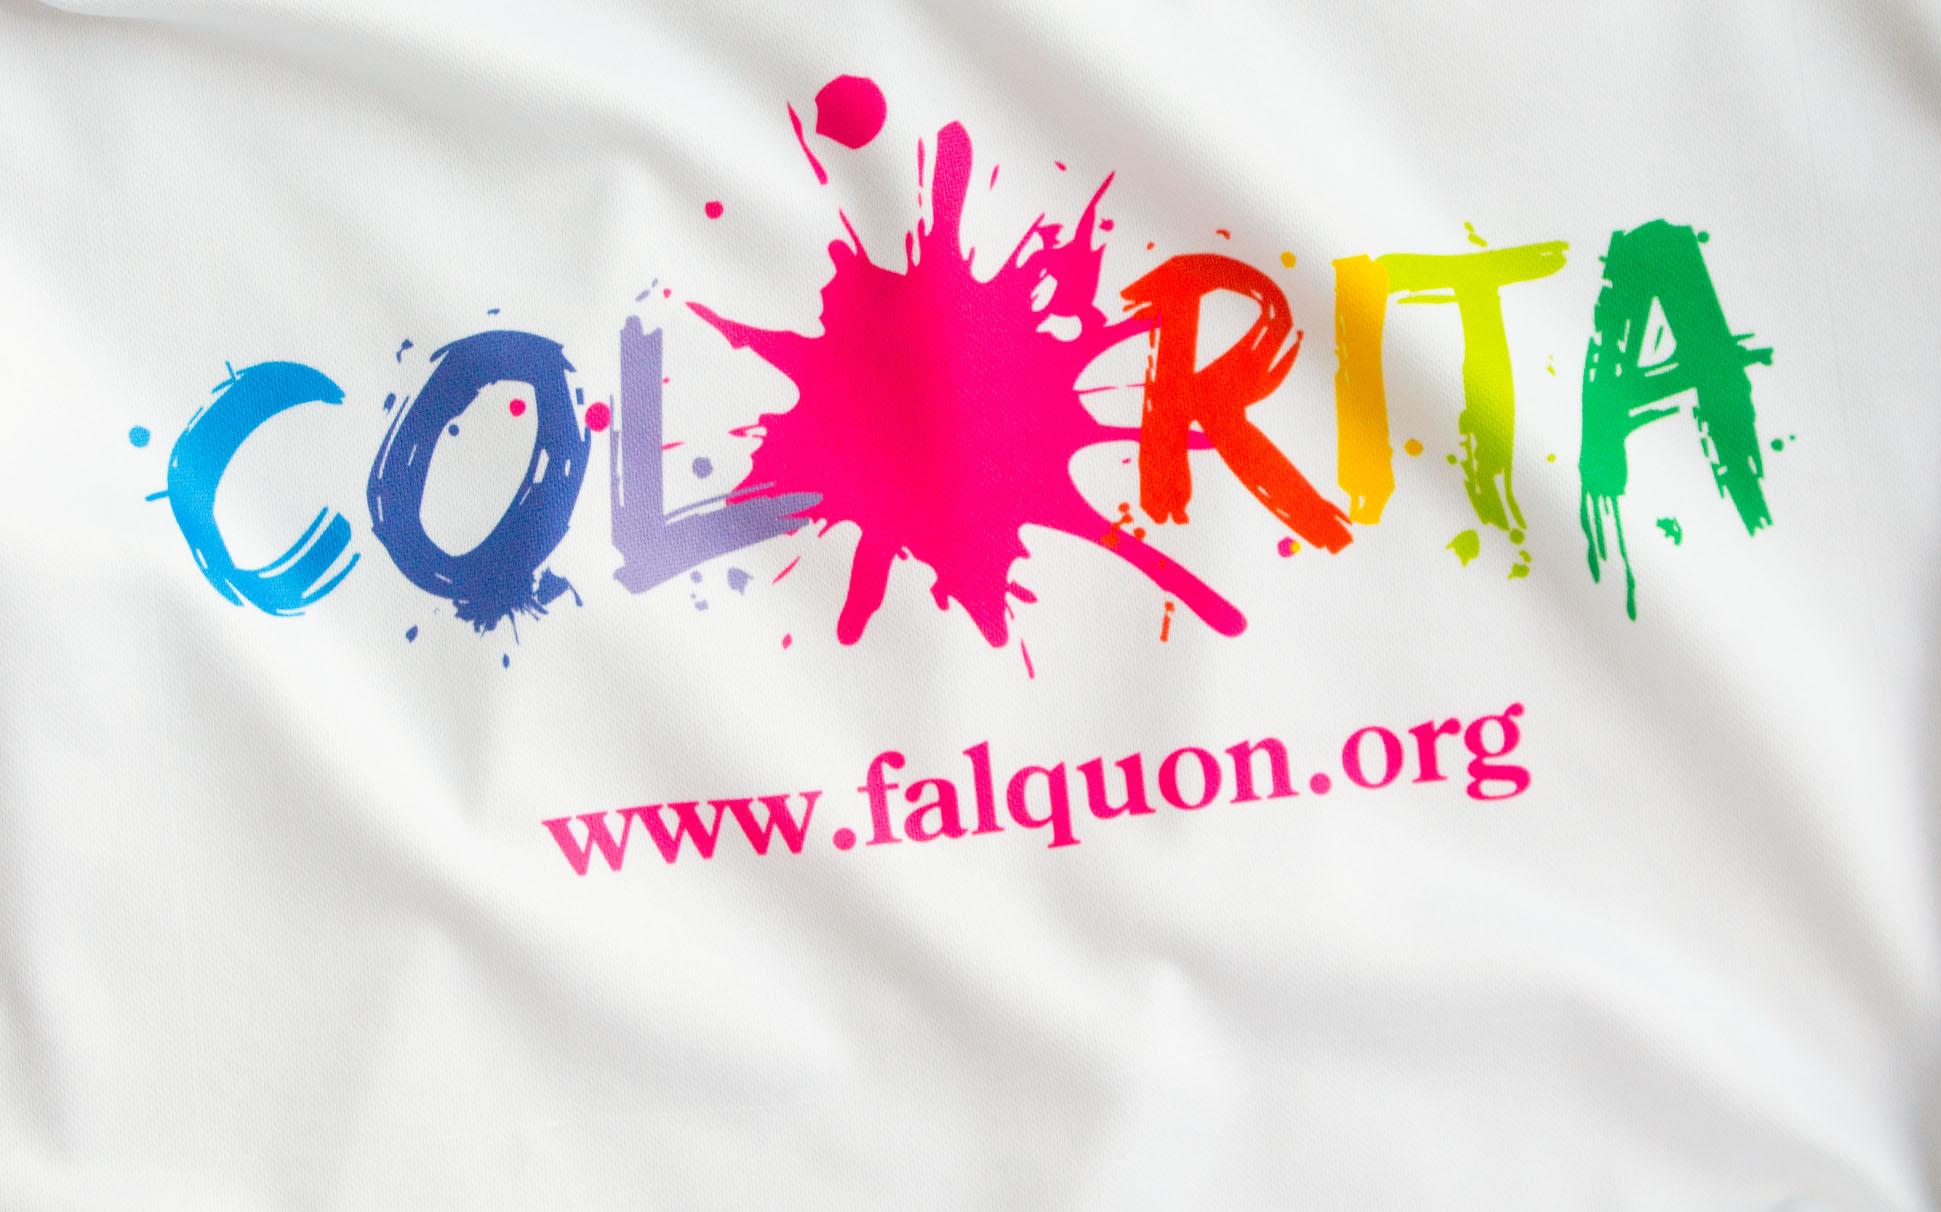 falquon-slider-9